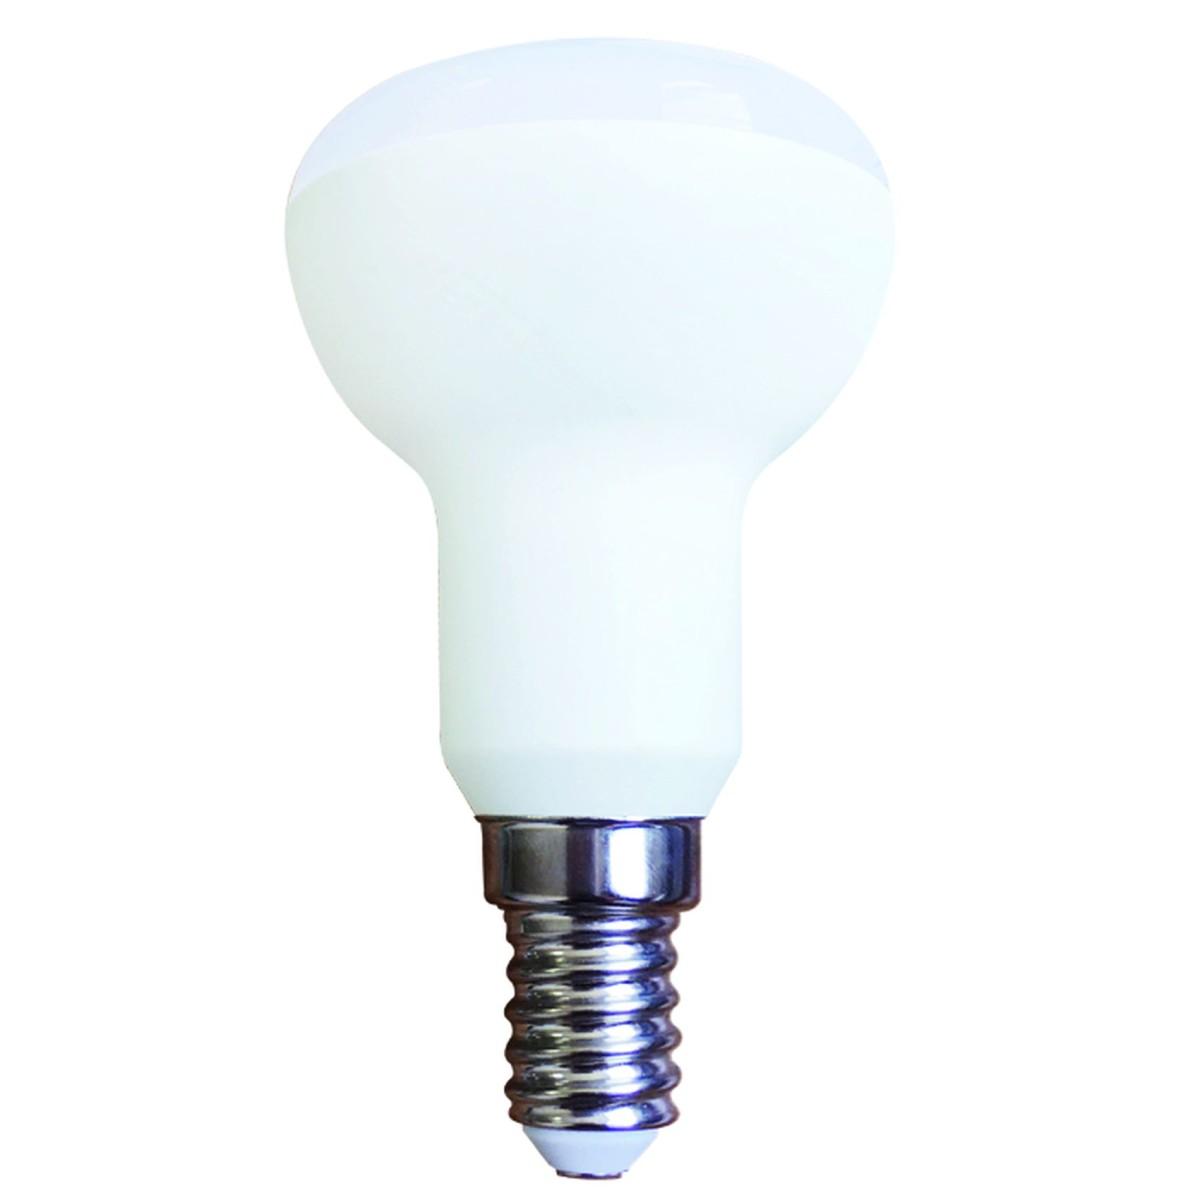 Лампа Ecola light E14 7 Вт рефлекторная 560 Лм теплый 4 шт